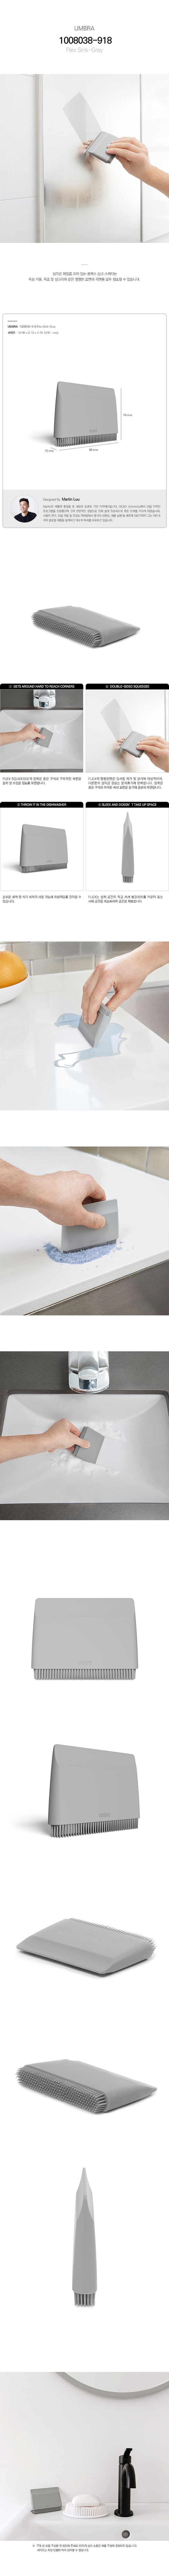 Flex-Sink-Gray_180409.jpg